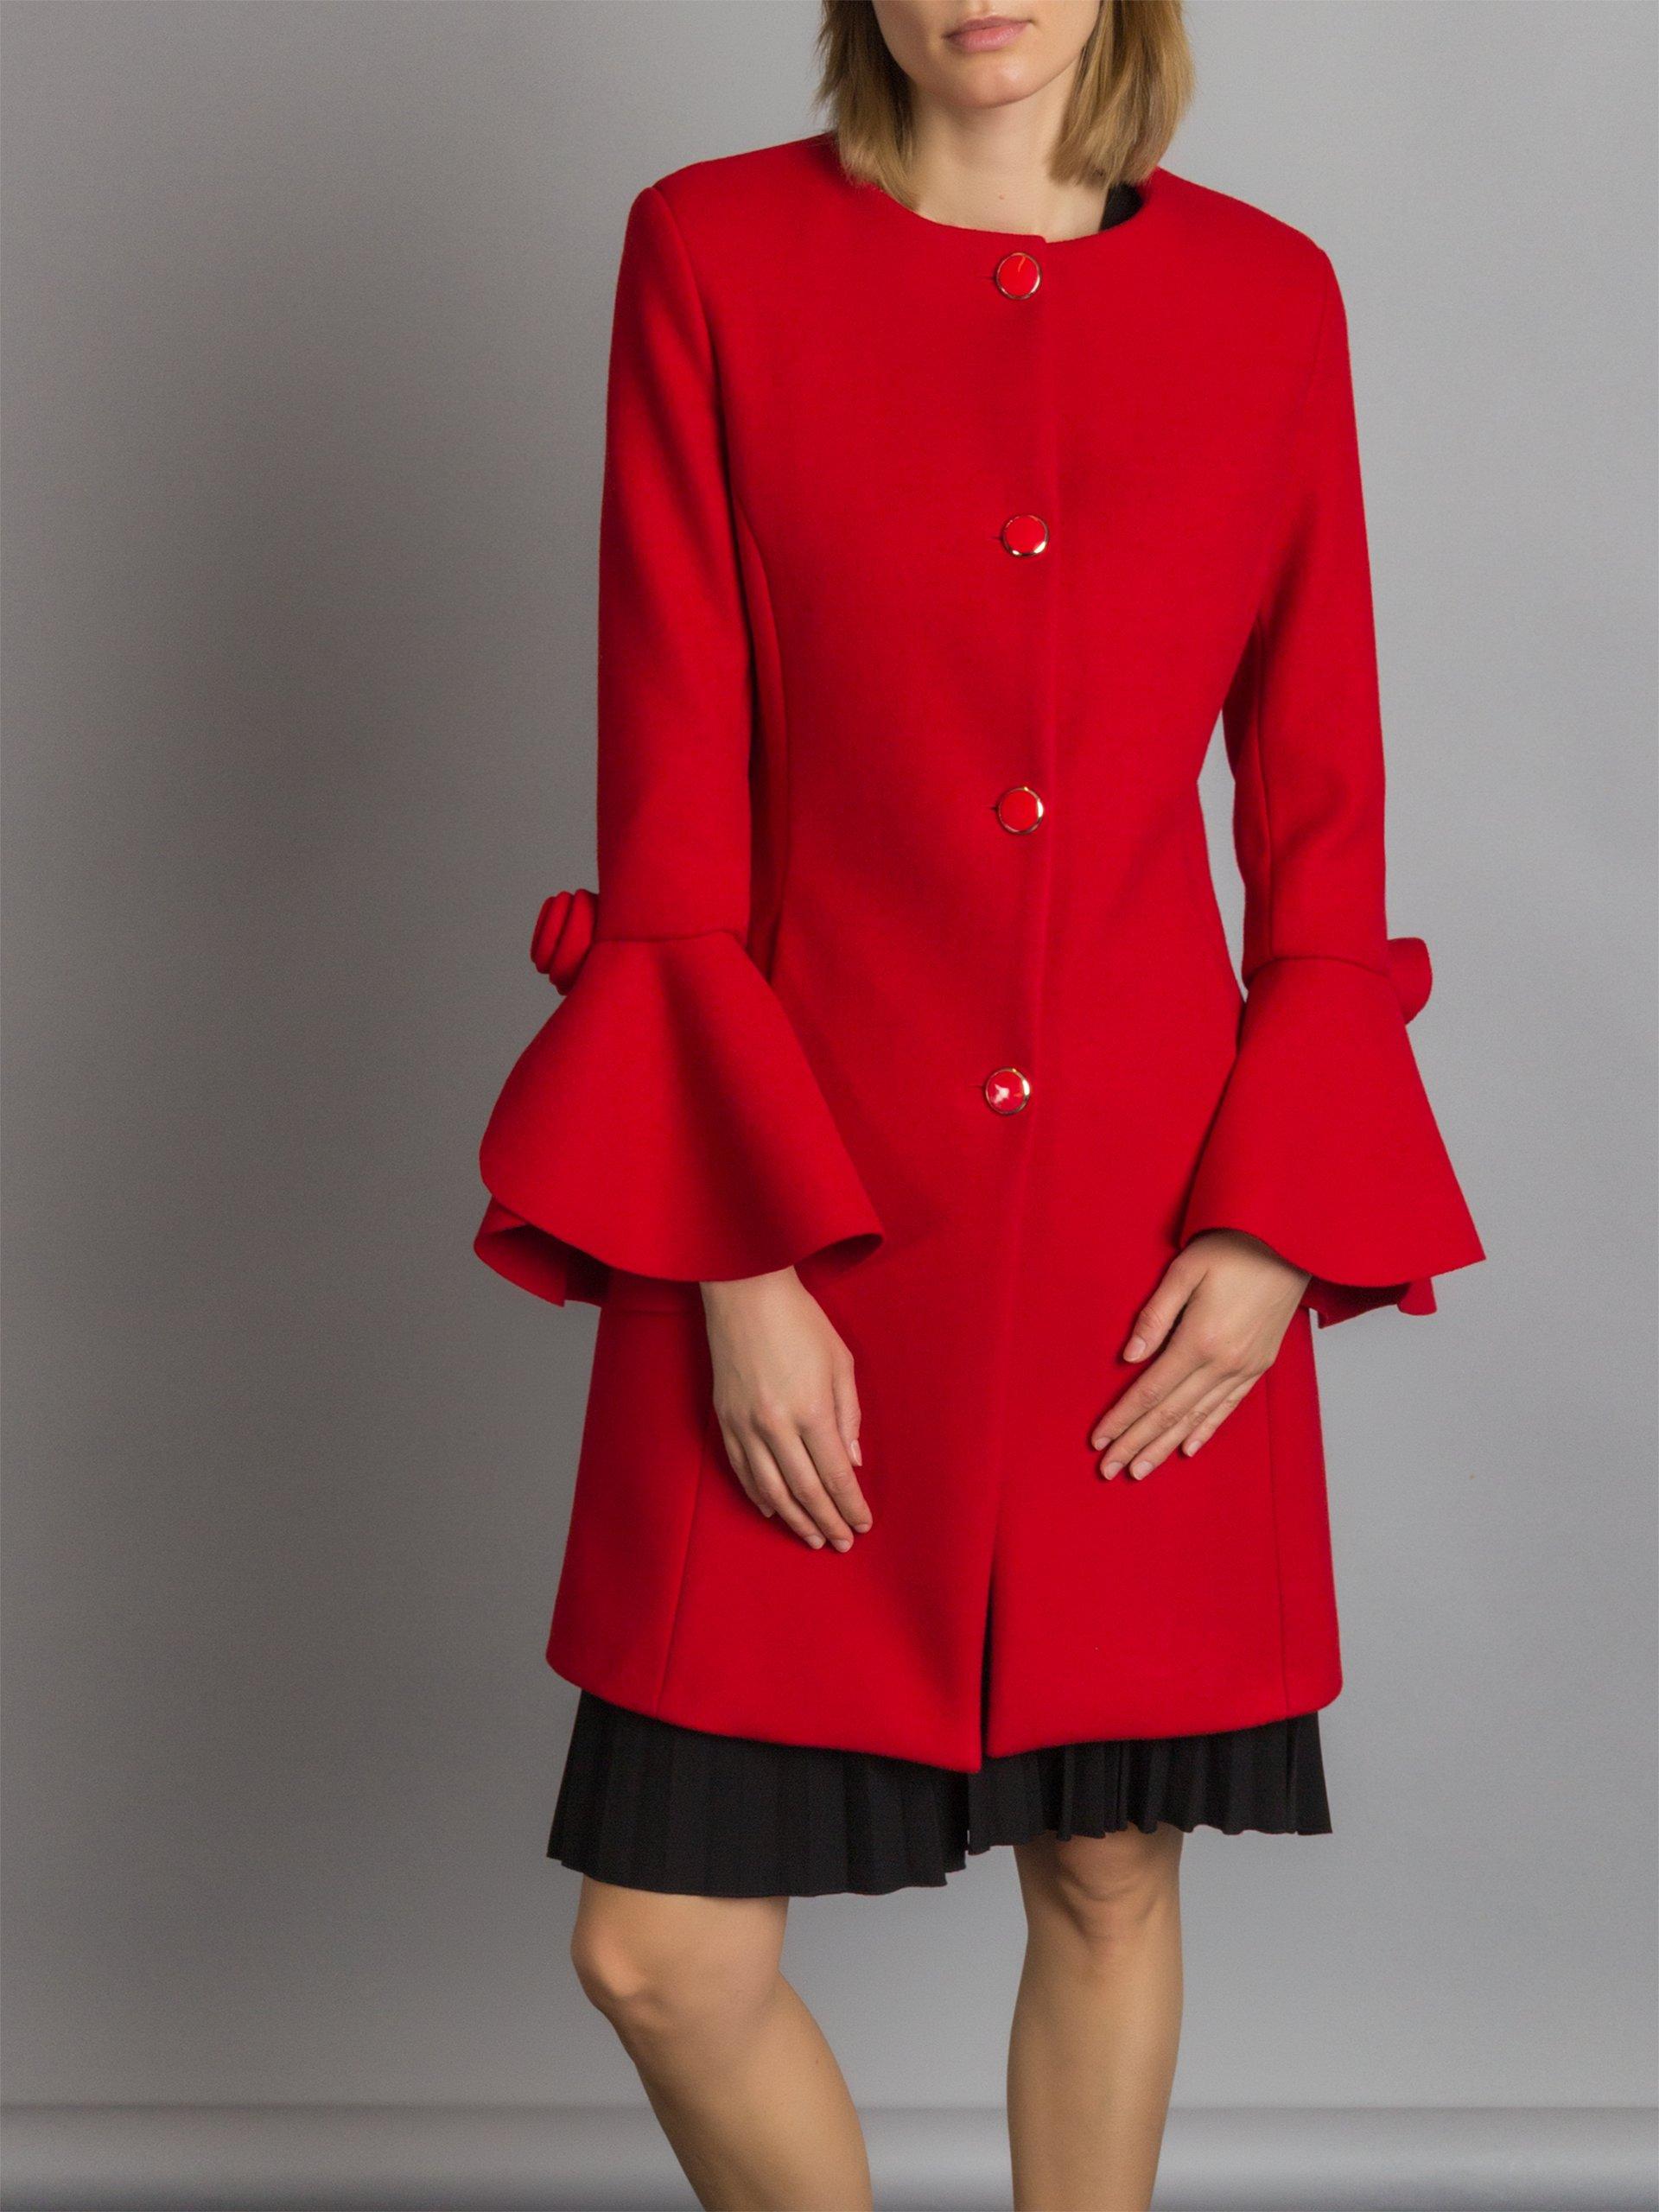 Cappotto elegante rosso Rinascimento a 139 euro